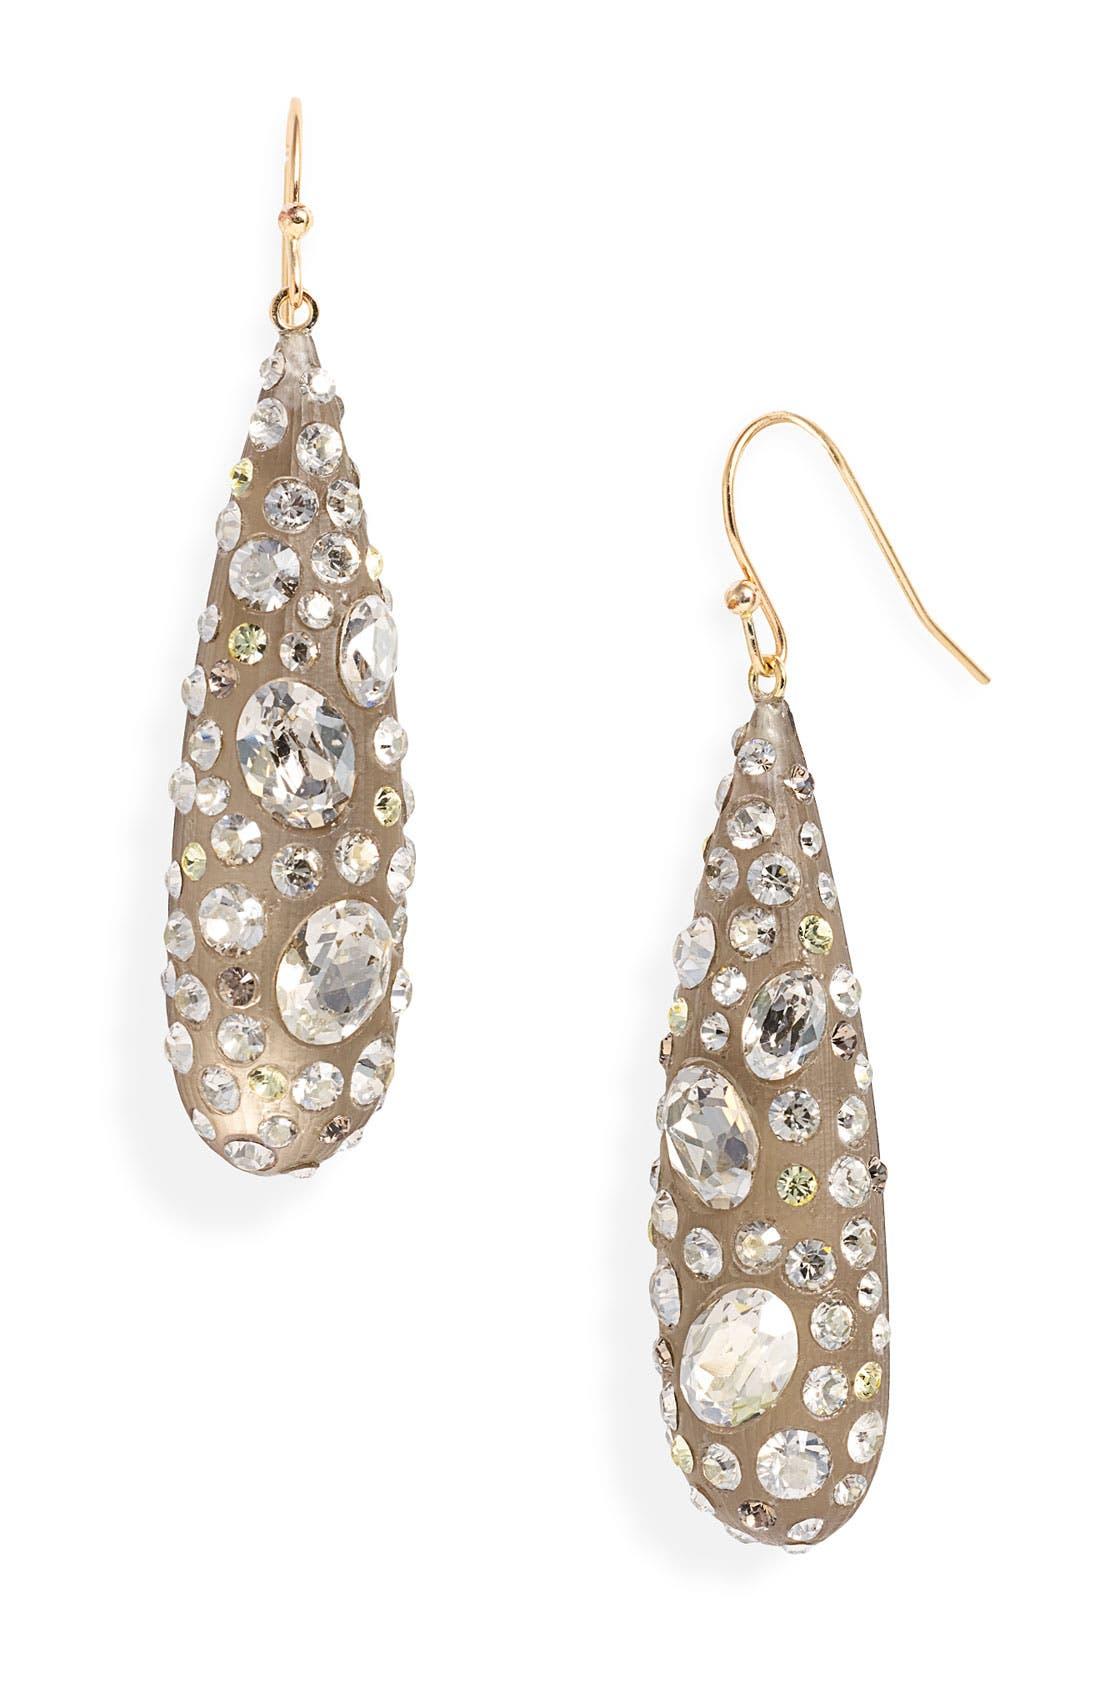 Main Image - Alexis Bittar 'Lucite® - Satin Dust' Teardrop Earrings